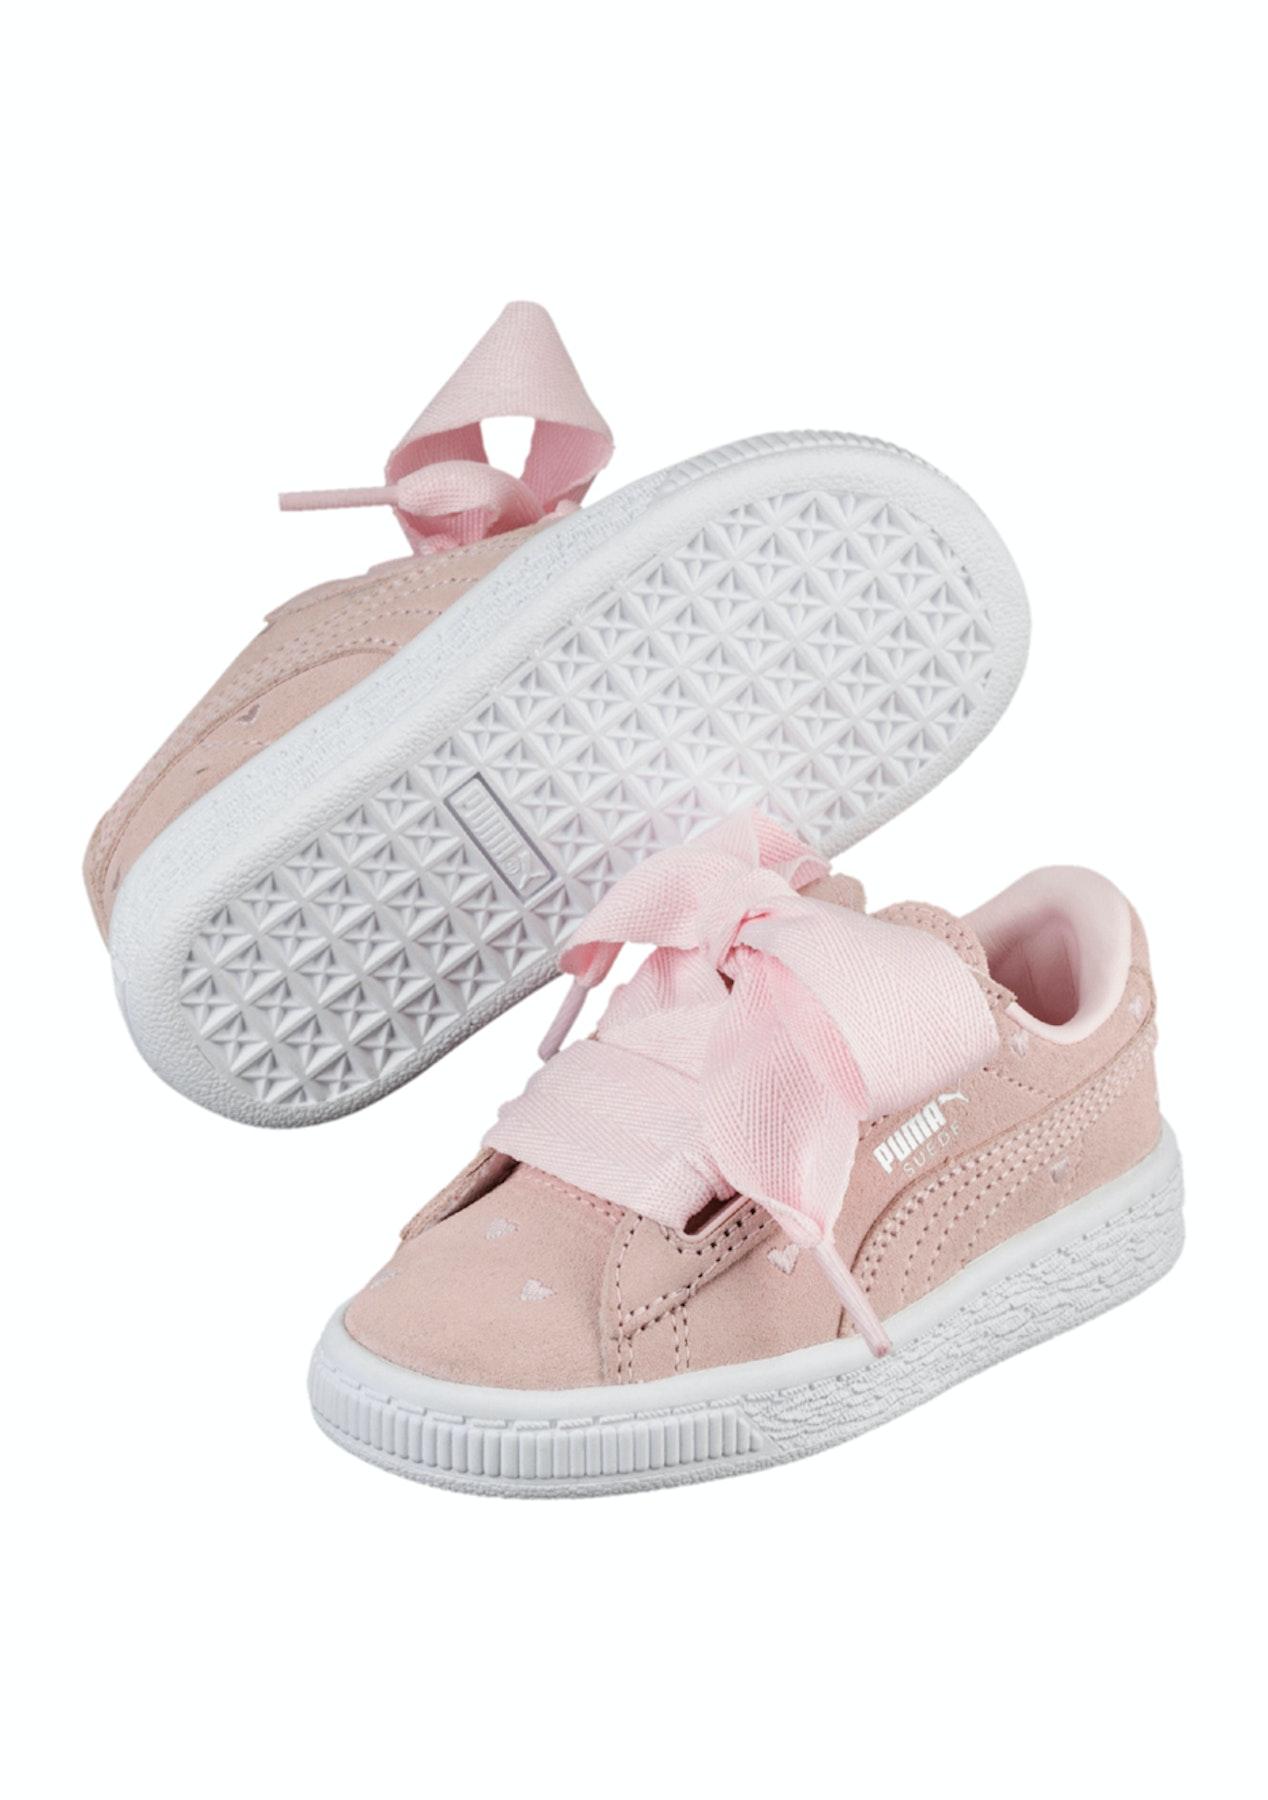 8d85d4692027 Puma Kids - Suede Heart Valentine Infants Pink - Puma Womens   Kids Up to  60% Off - Onceit